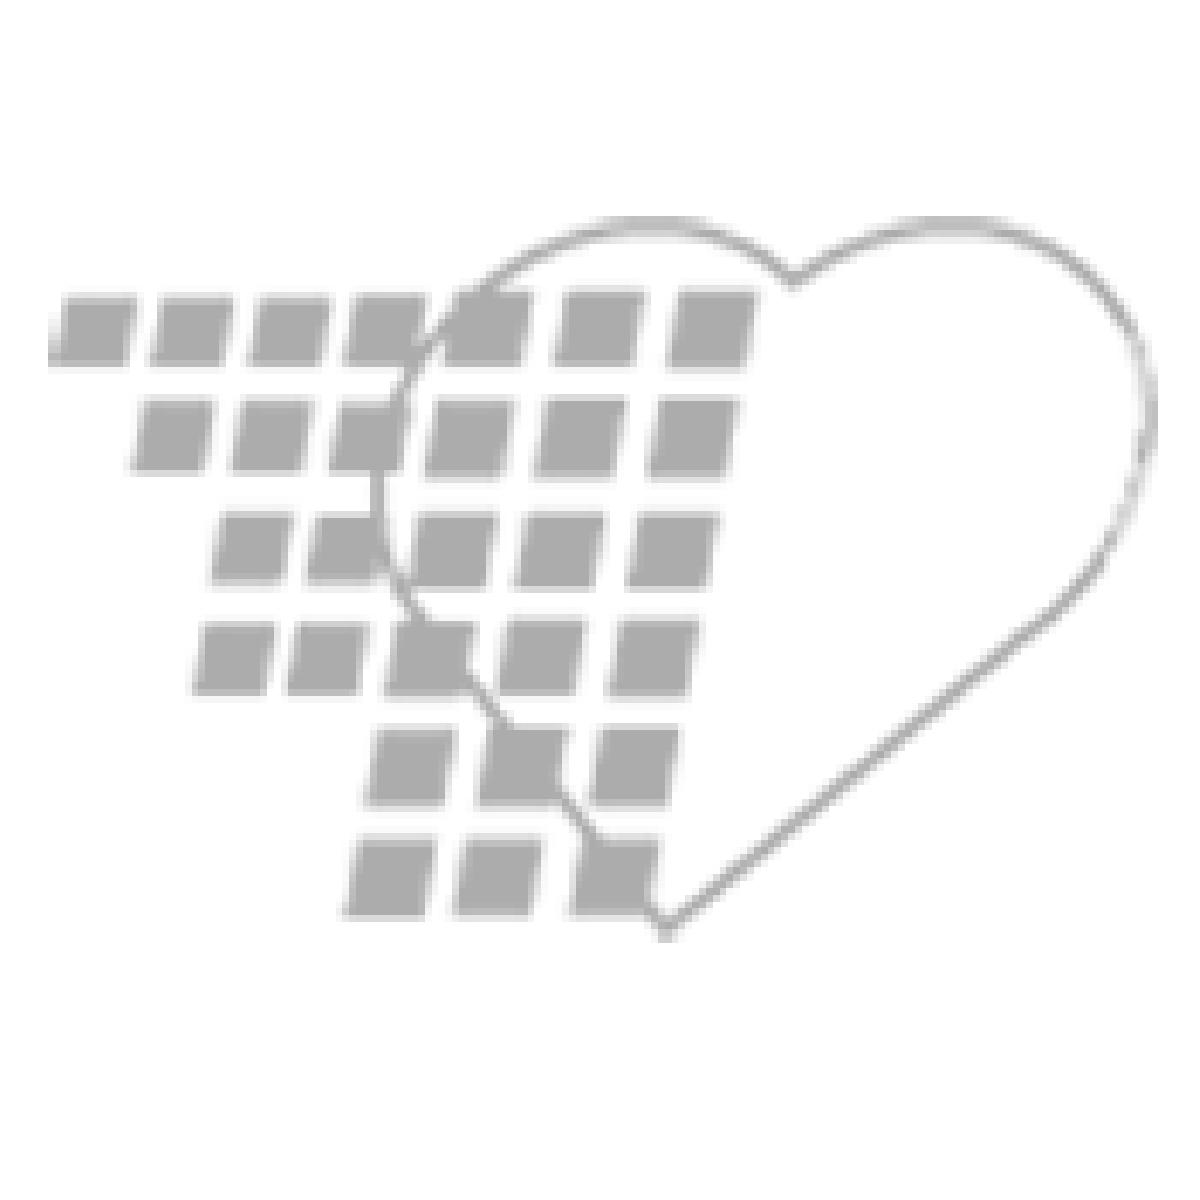 06-93-0412 - Demo Dose® Sodim Chlorid 100mL 4mEq/mL 100 mL